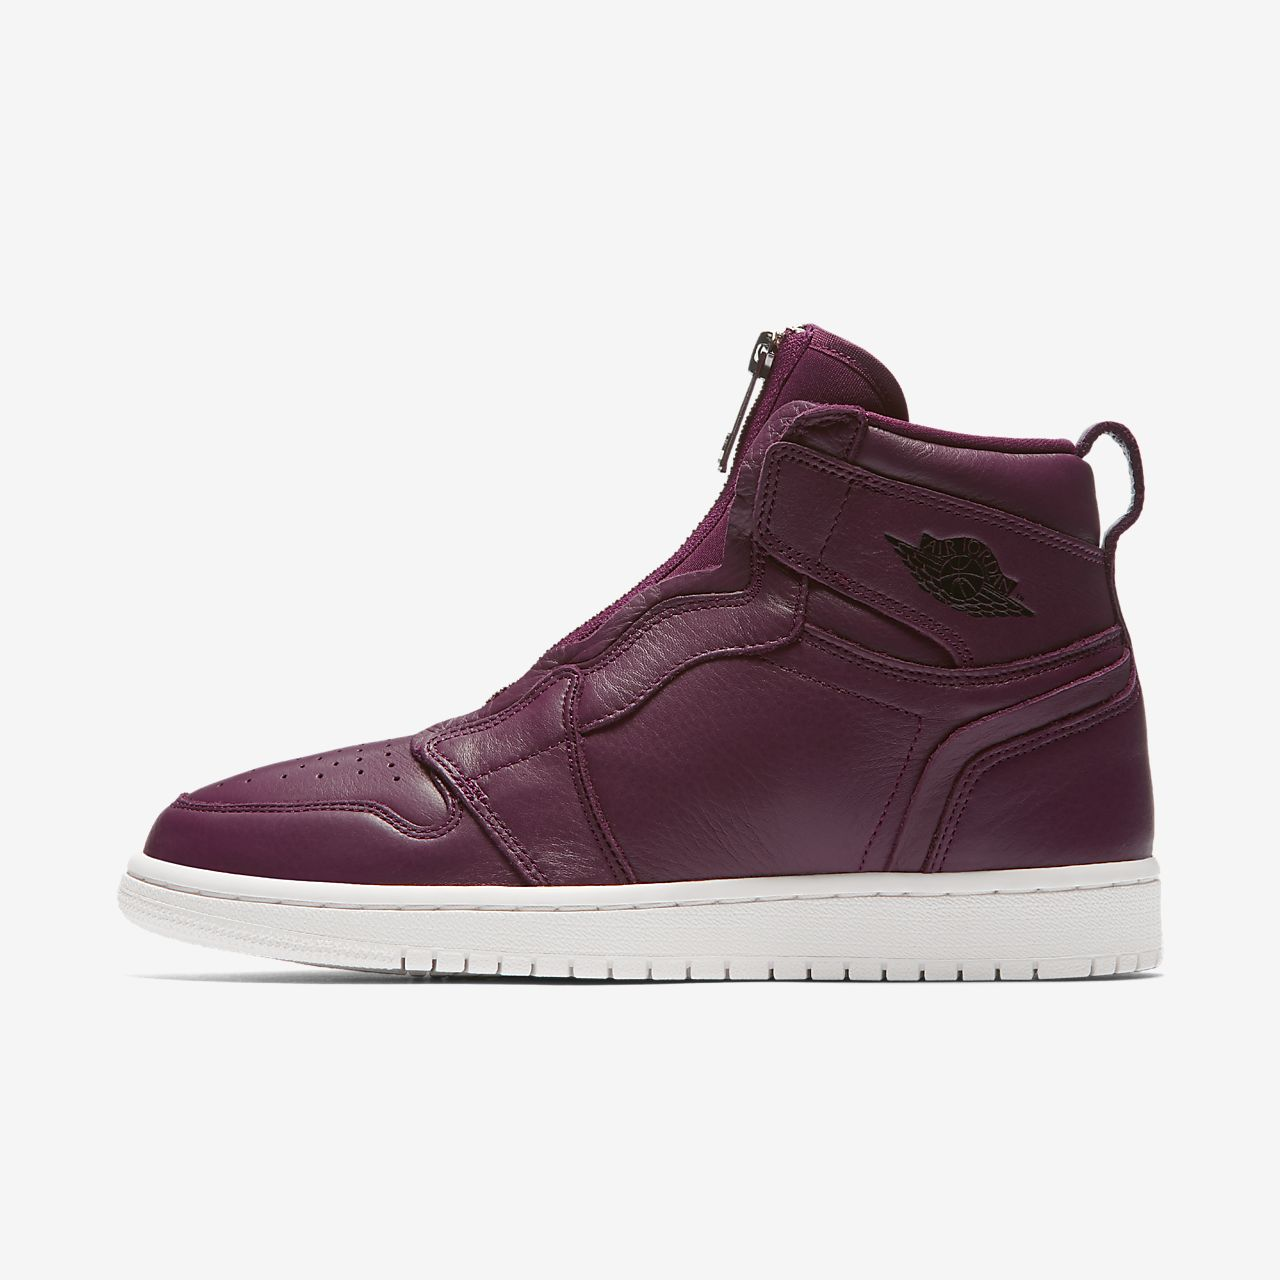 bfef03b200e0db Air Jordan 1 High Zip Premium Women s Shoe. Nike.com GB